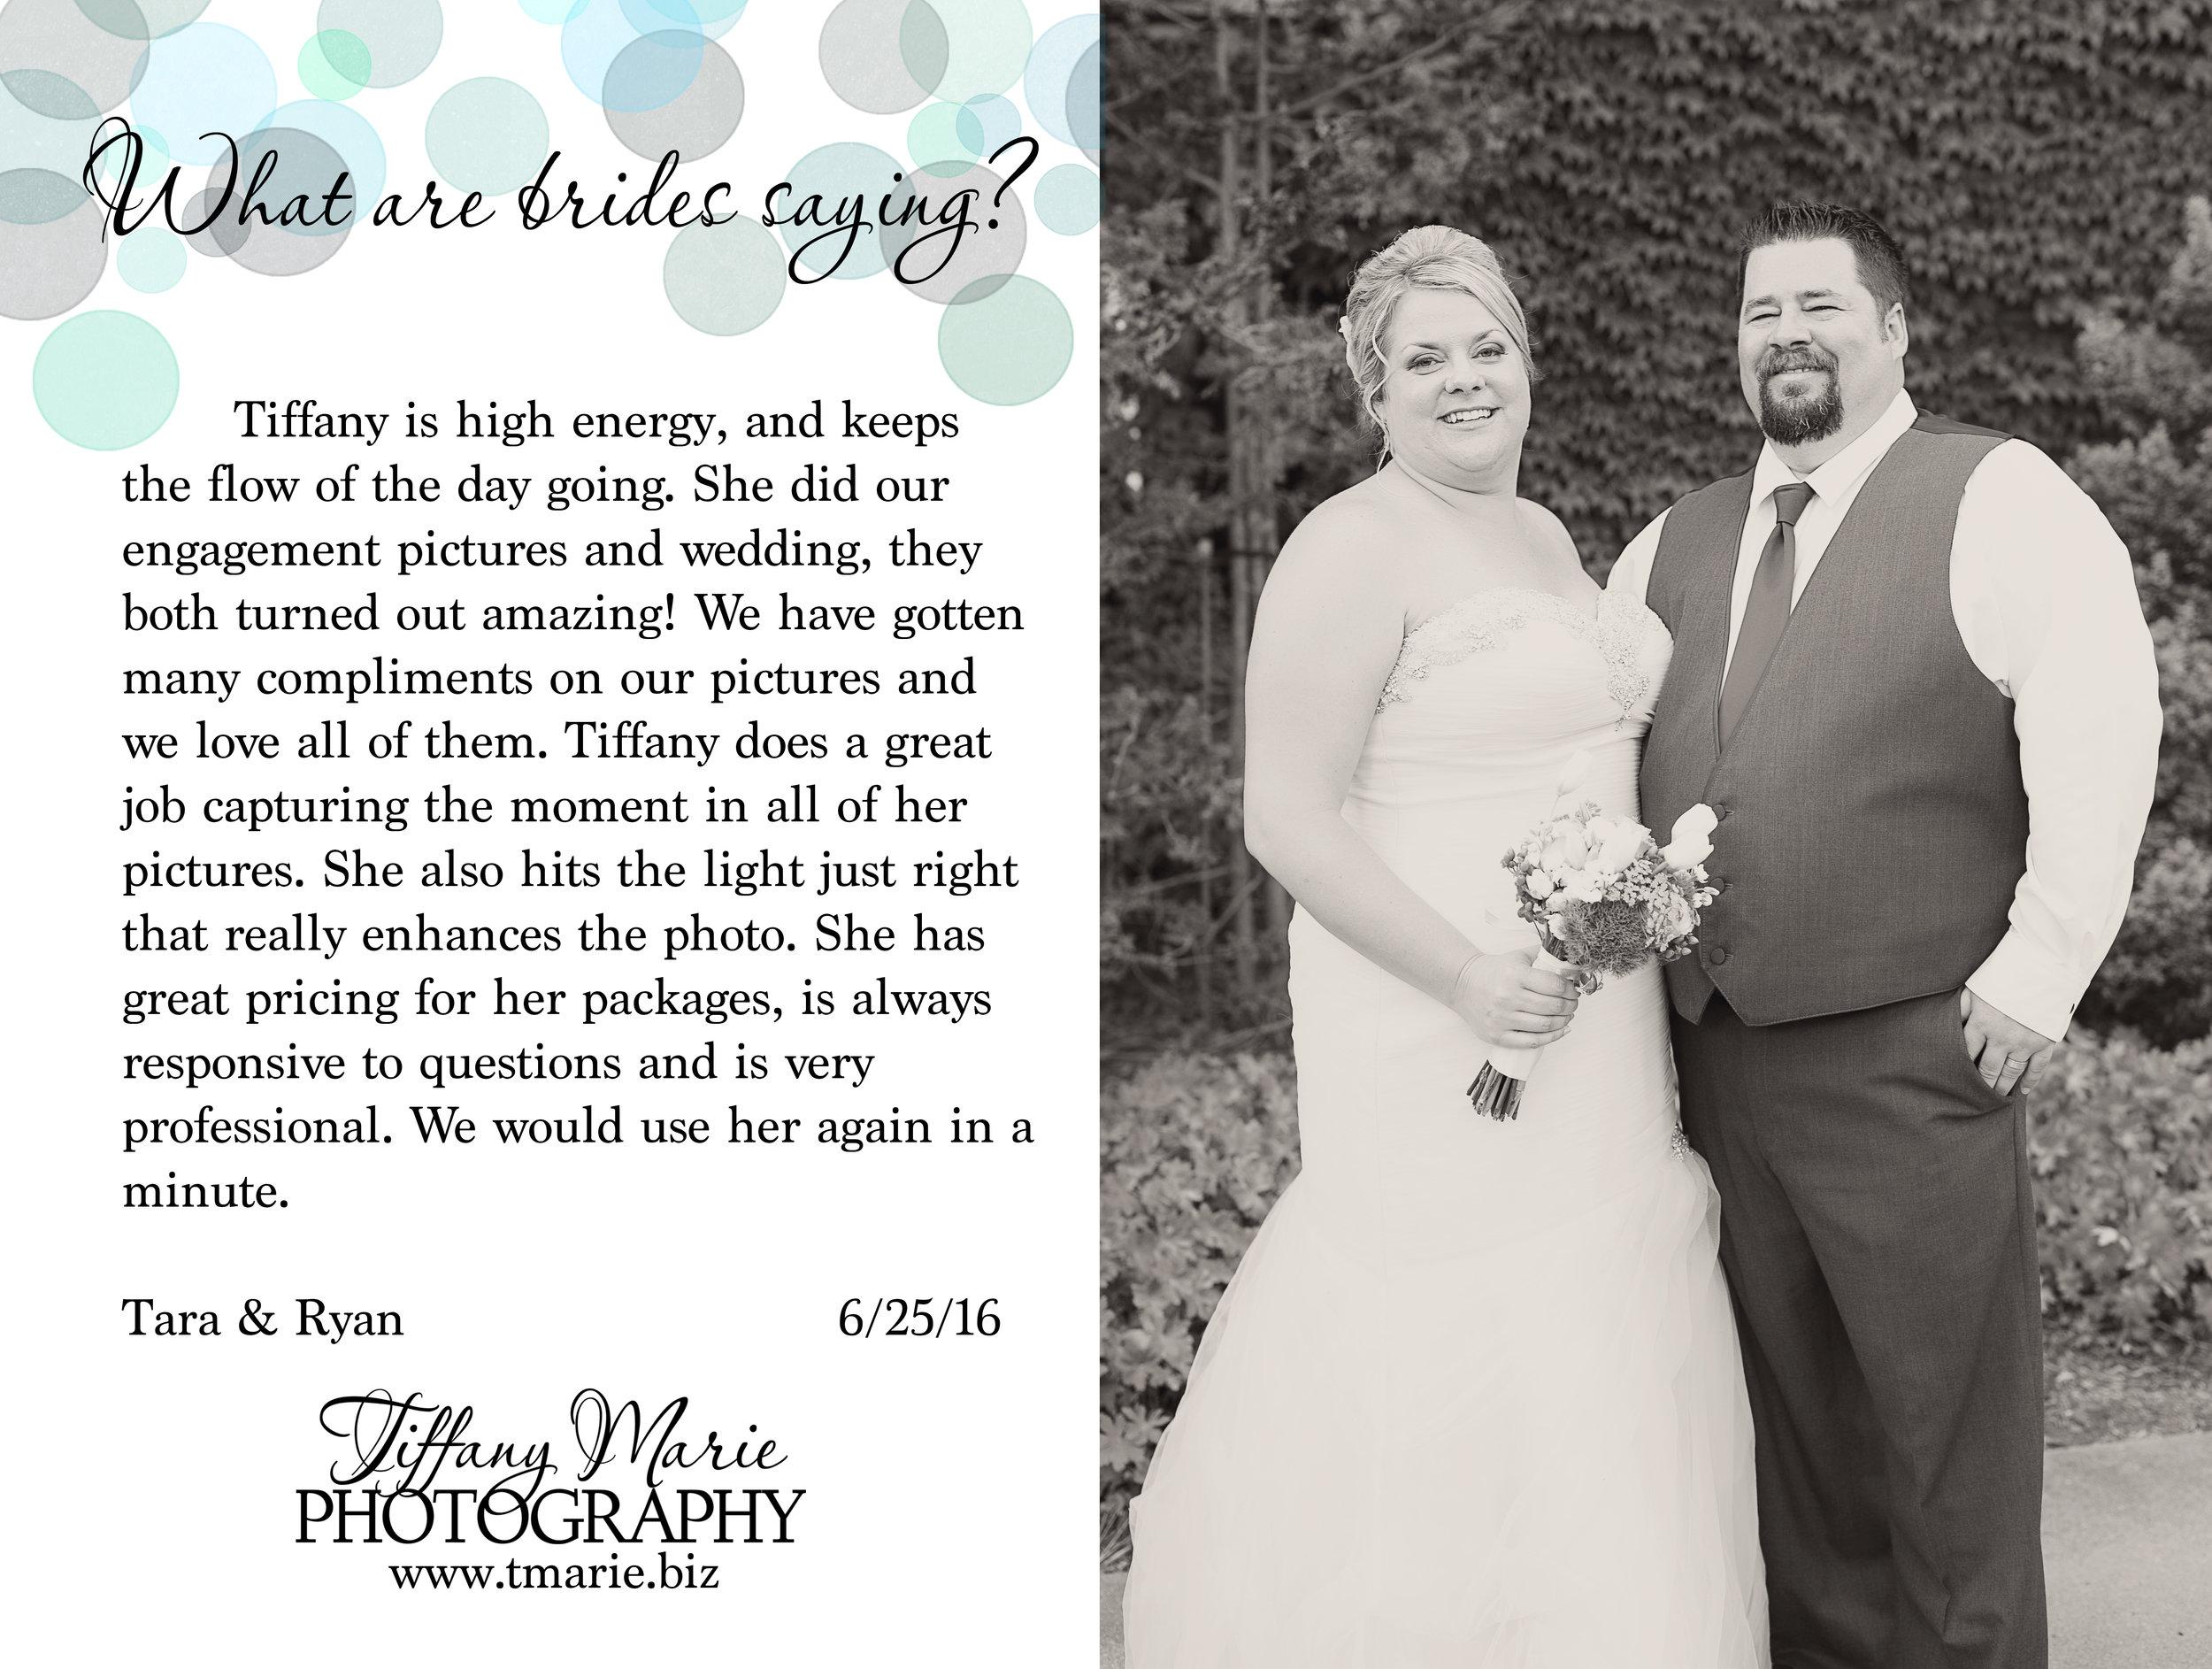 weddingreviewtiffanymariephotography.jpg